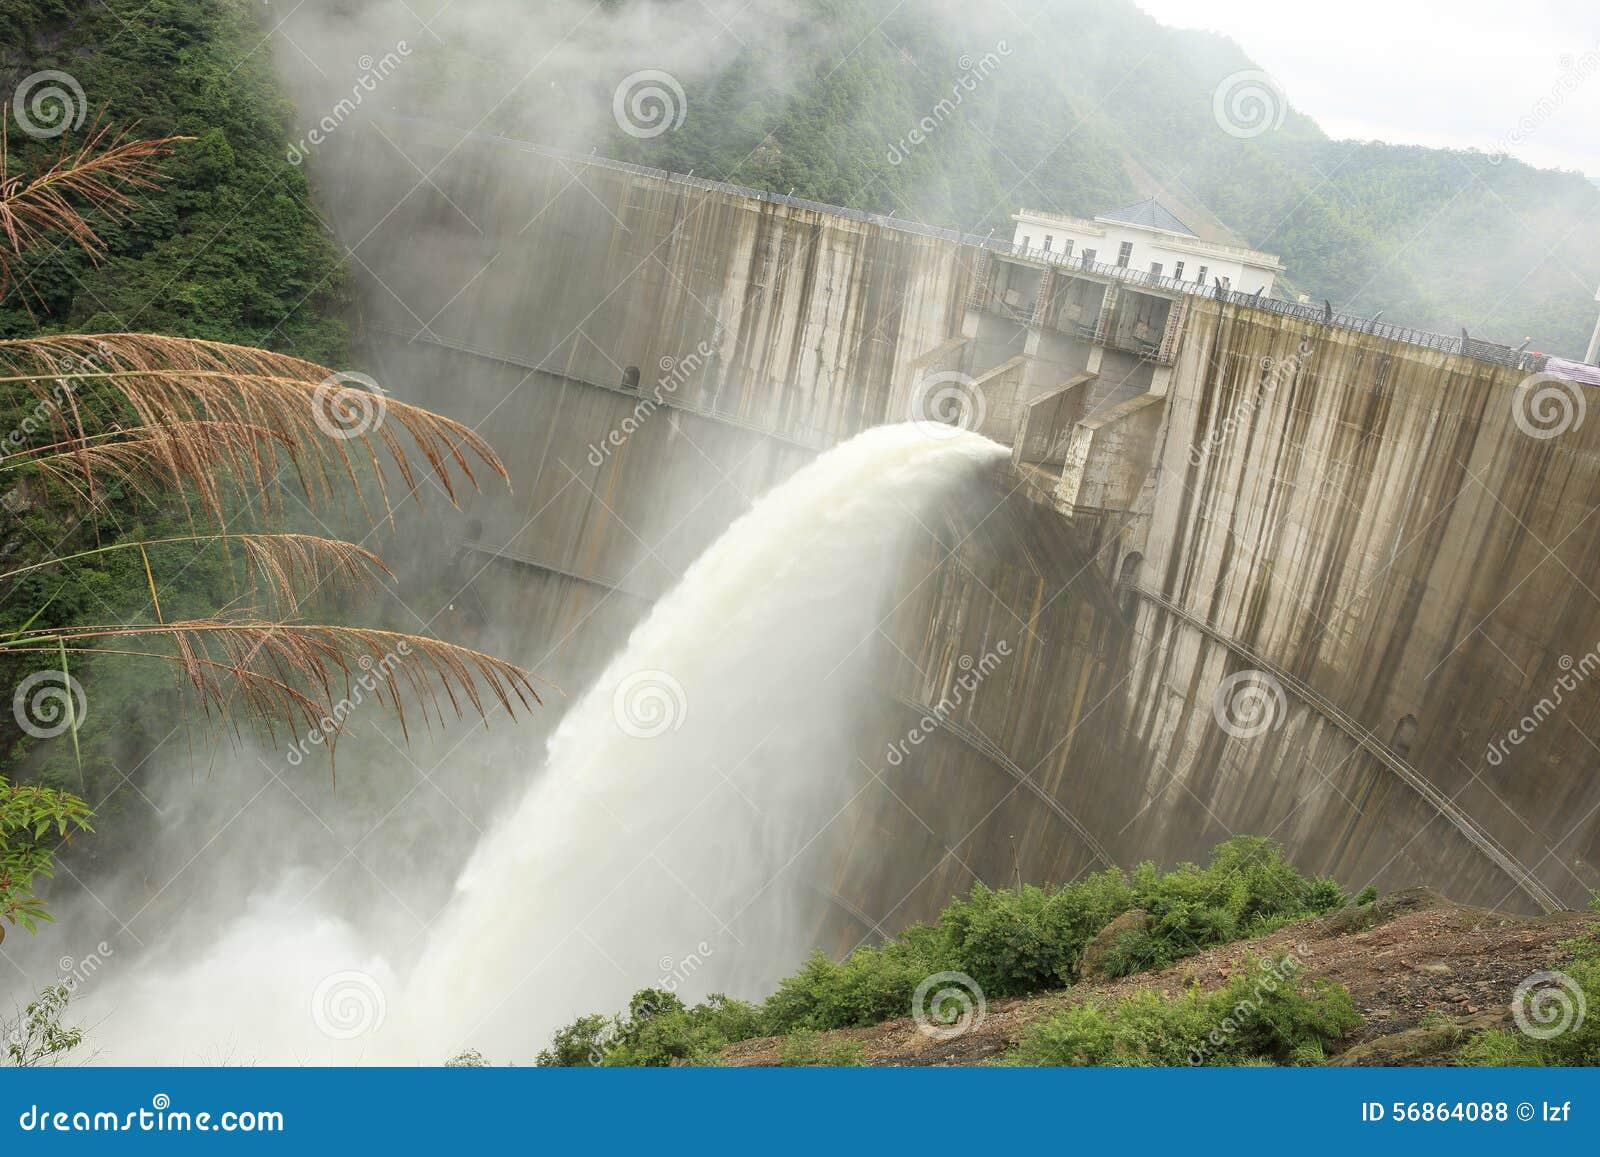 Água da inundação da descarga da represa